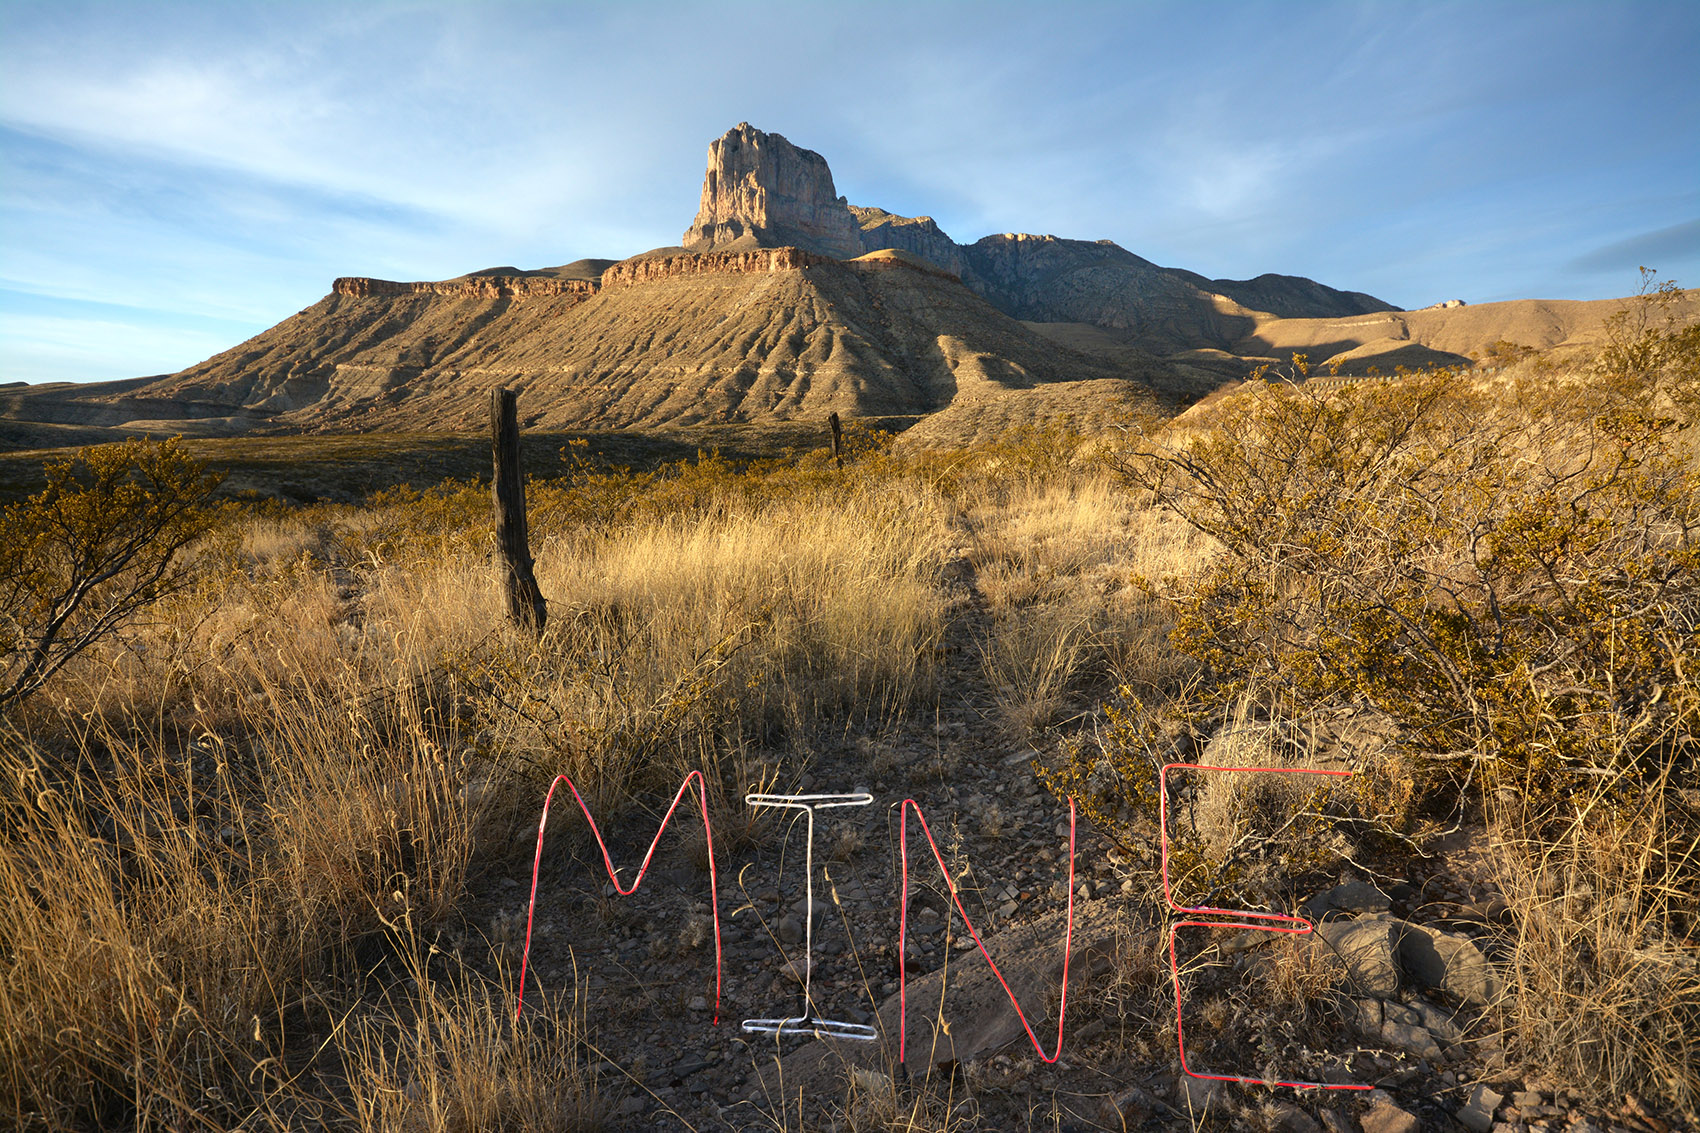 Texas landscape with text sculpture 'MINE'